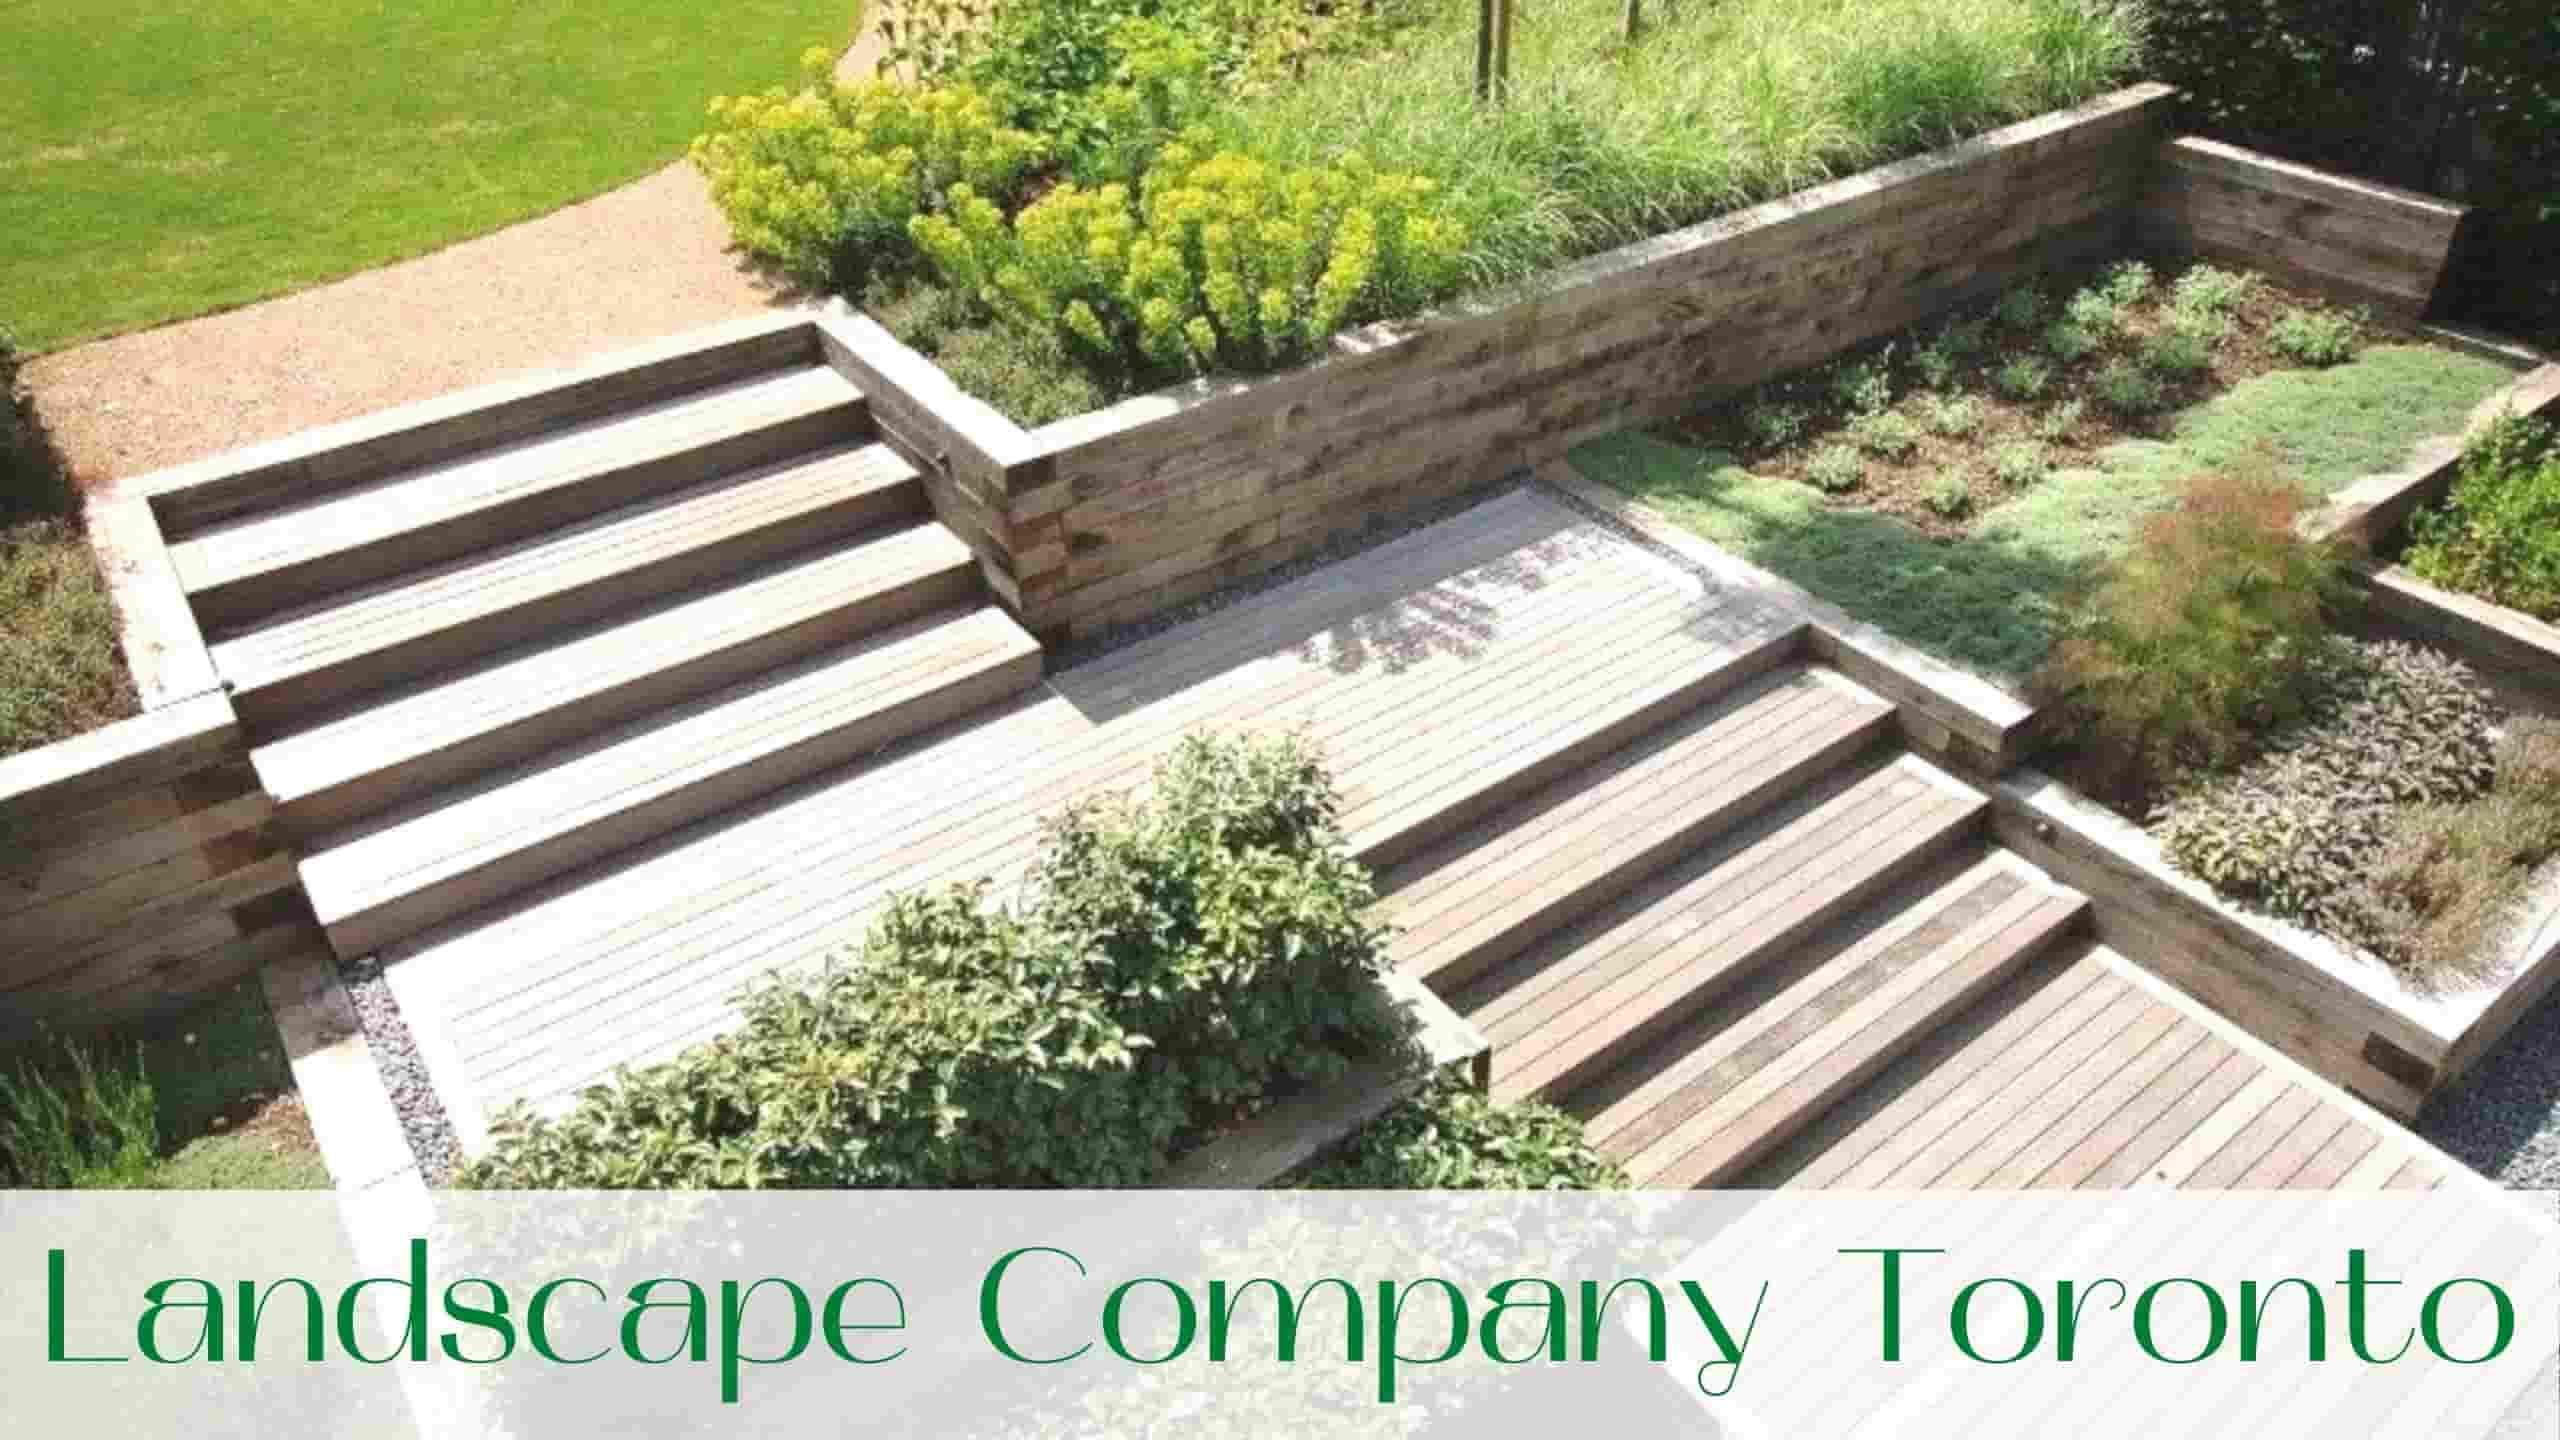 image-Landscape-Company-in-Toronto